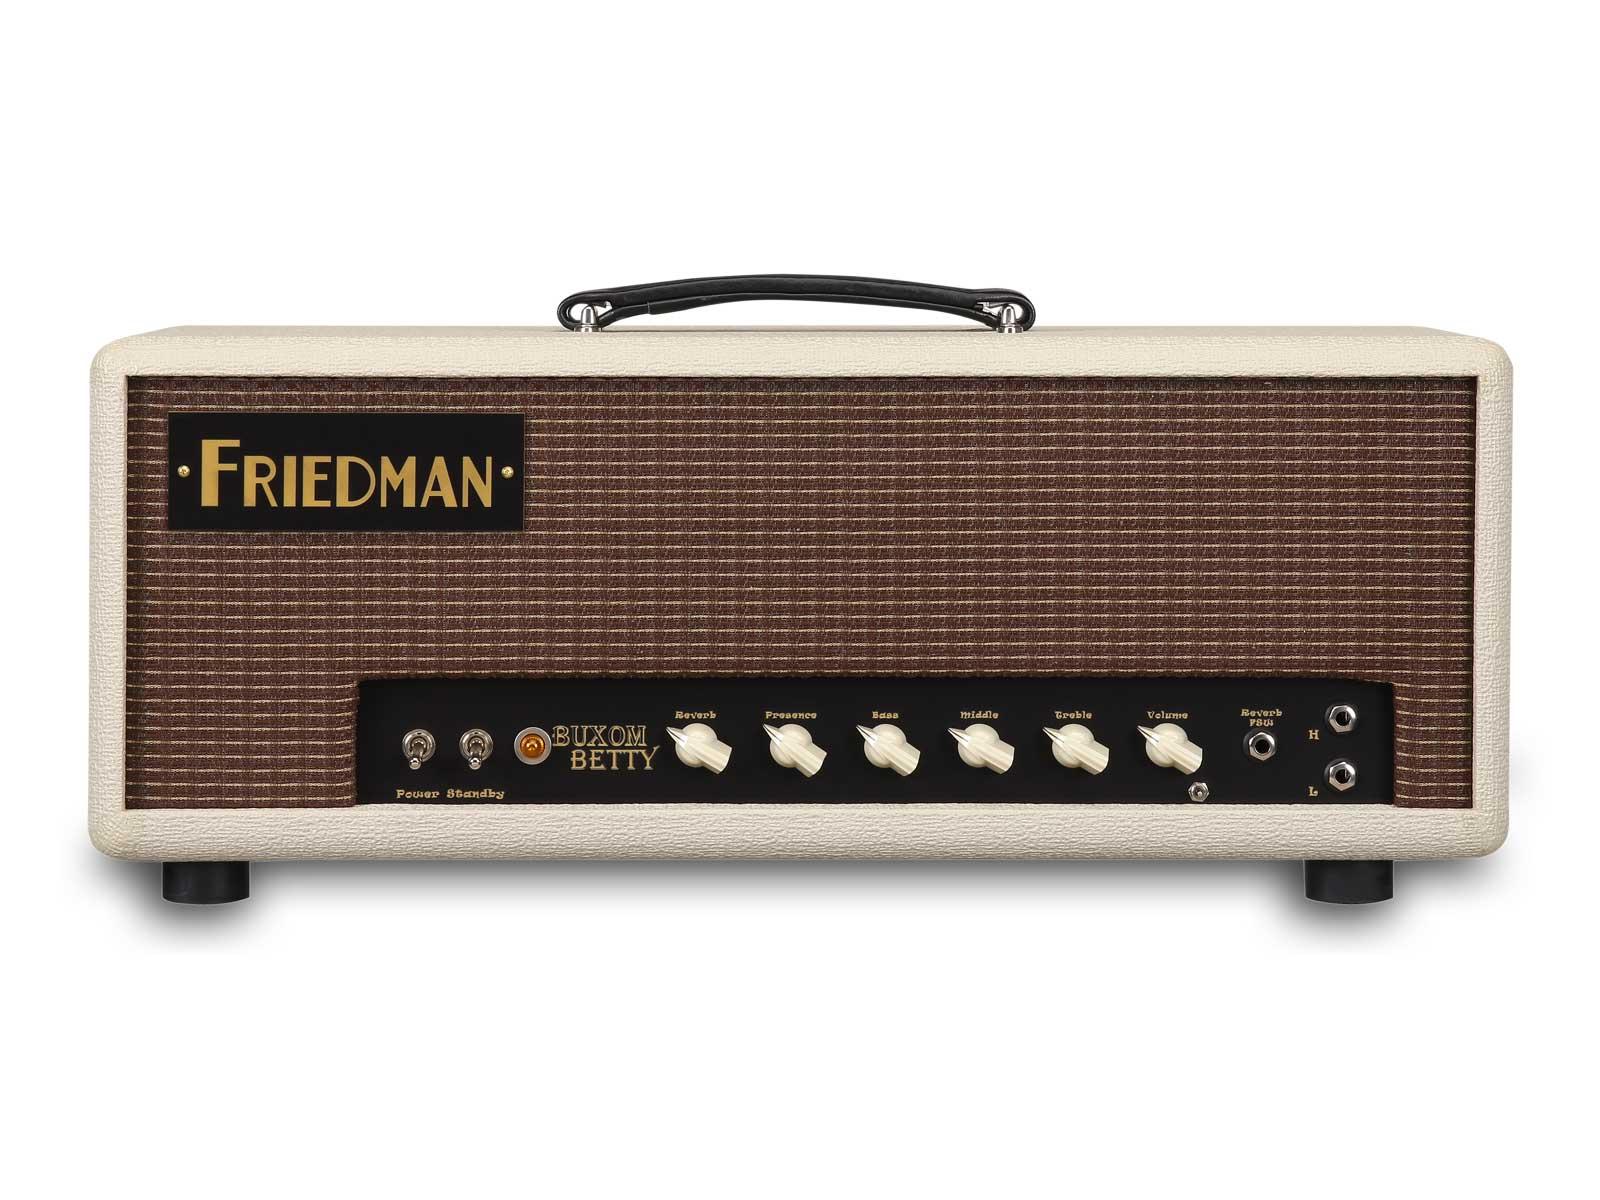 Friedman Amplification   BUXOM BETTY 1600x1200